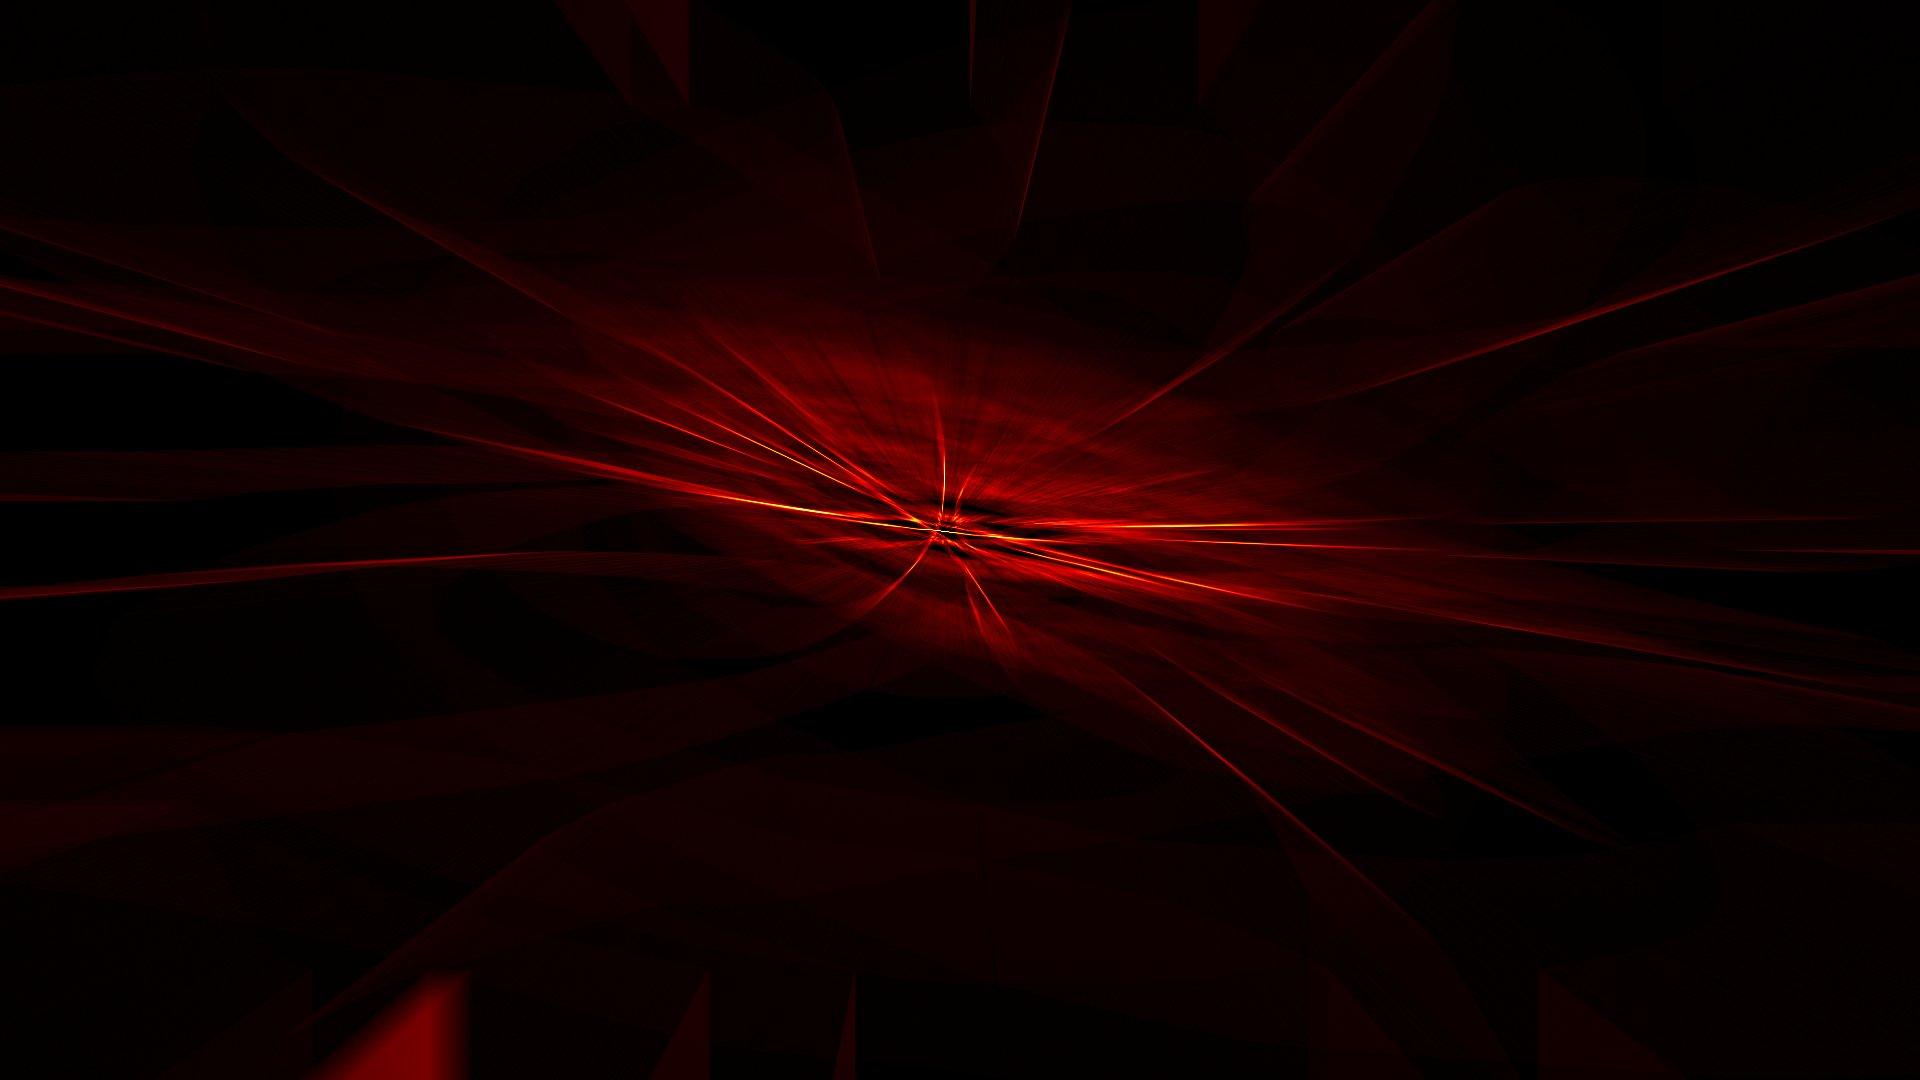 Abstracto - Rojo  Czerwony Fondo de Pantalla